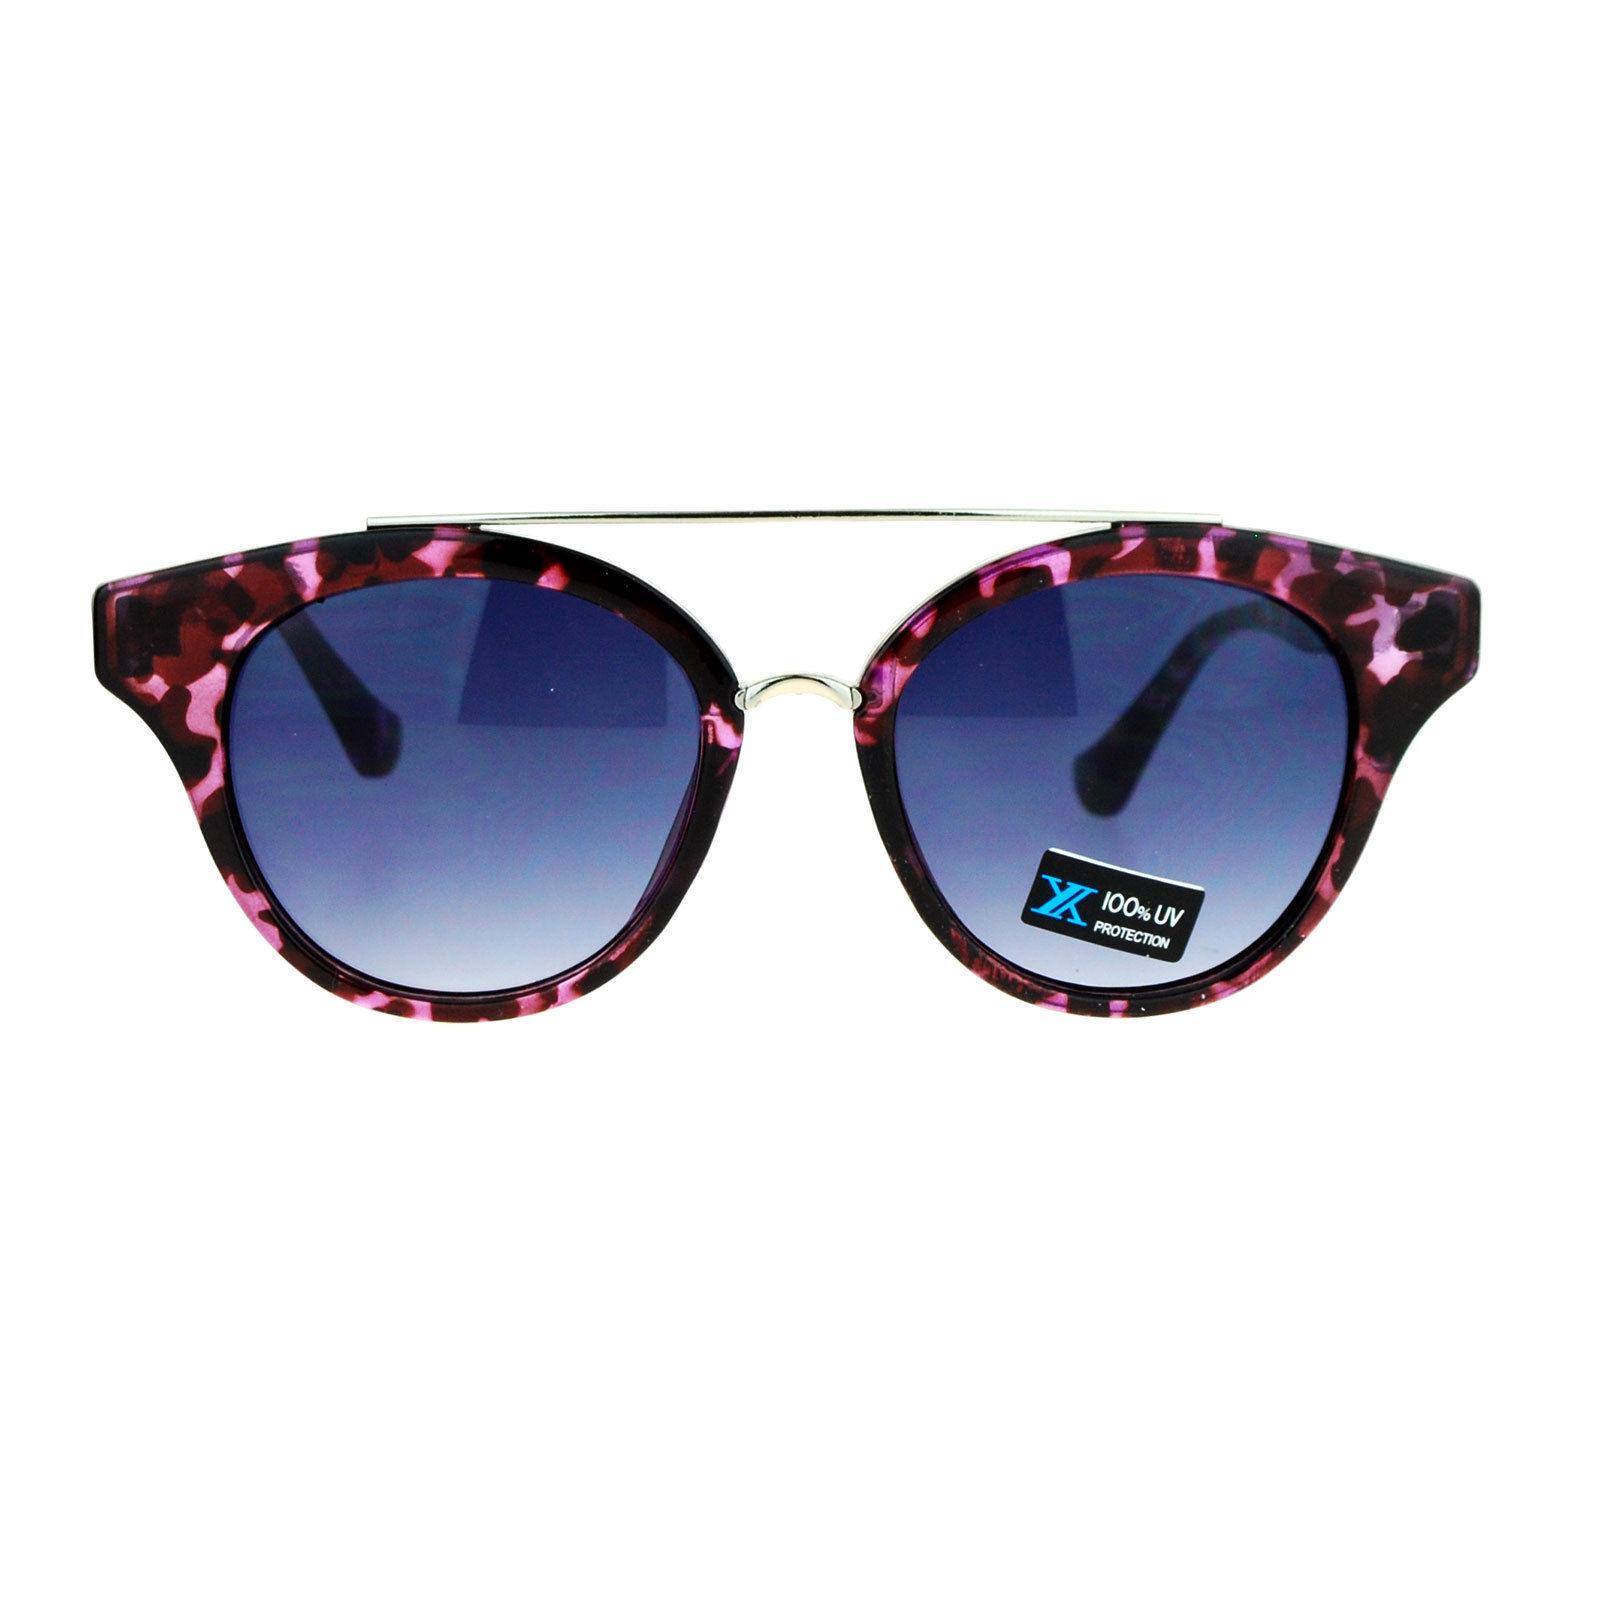 Womens Fashion Sunglasses Retro Designer Horn Rim Cateye Top Bar UV400